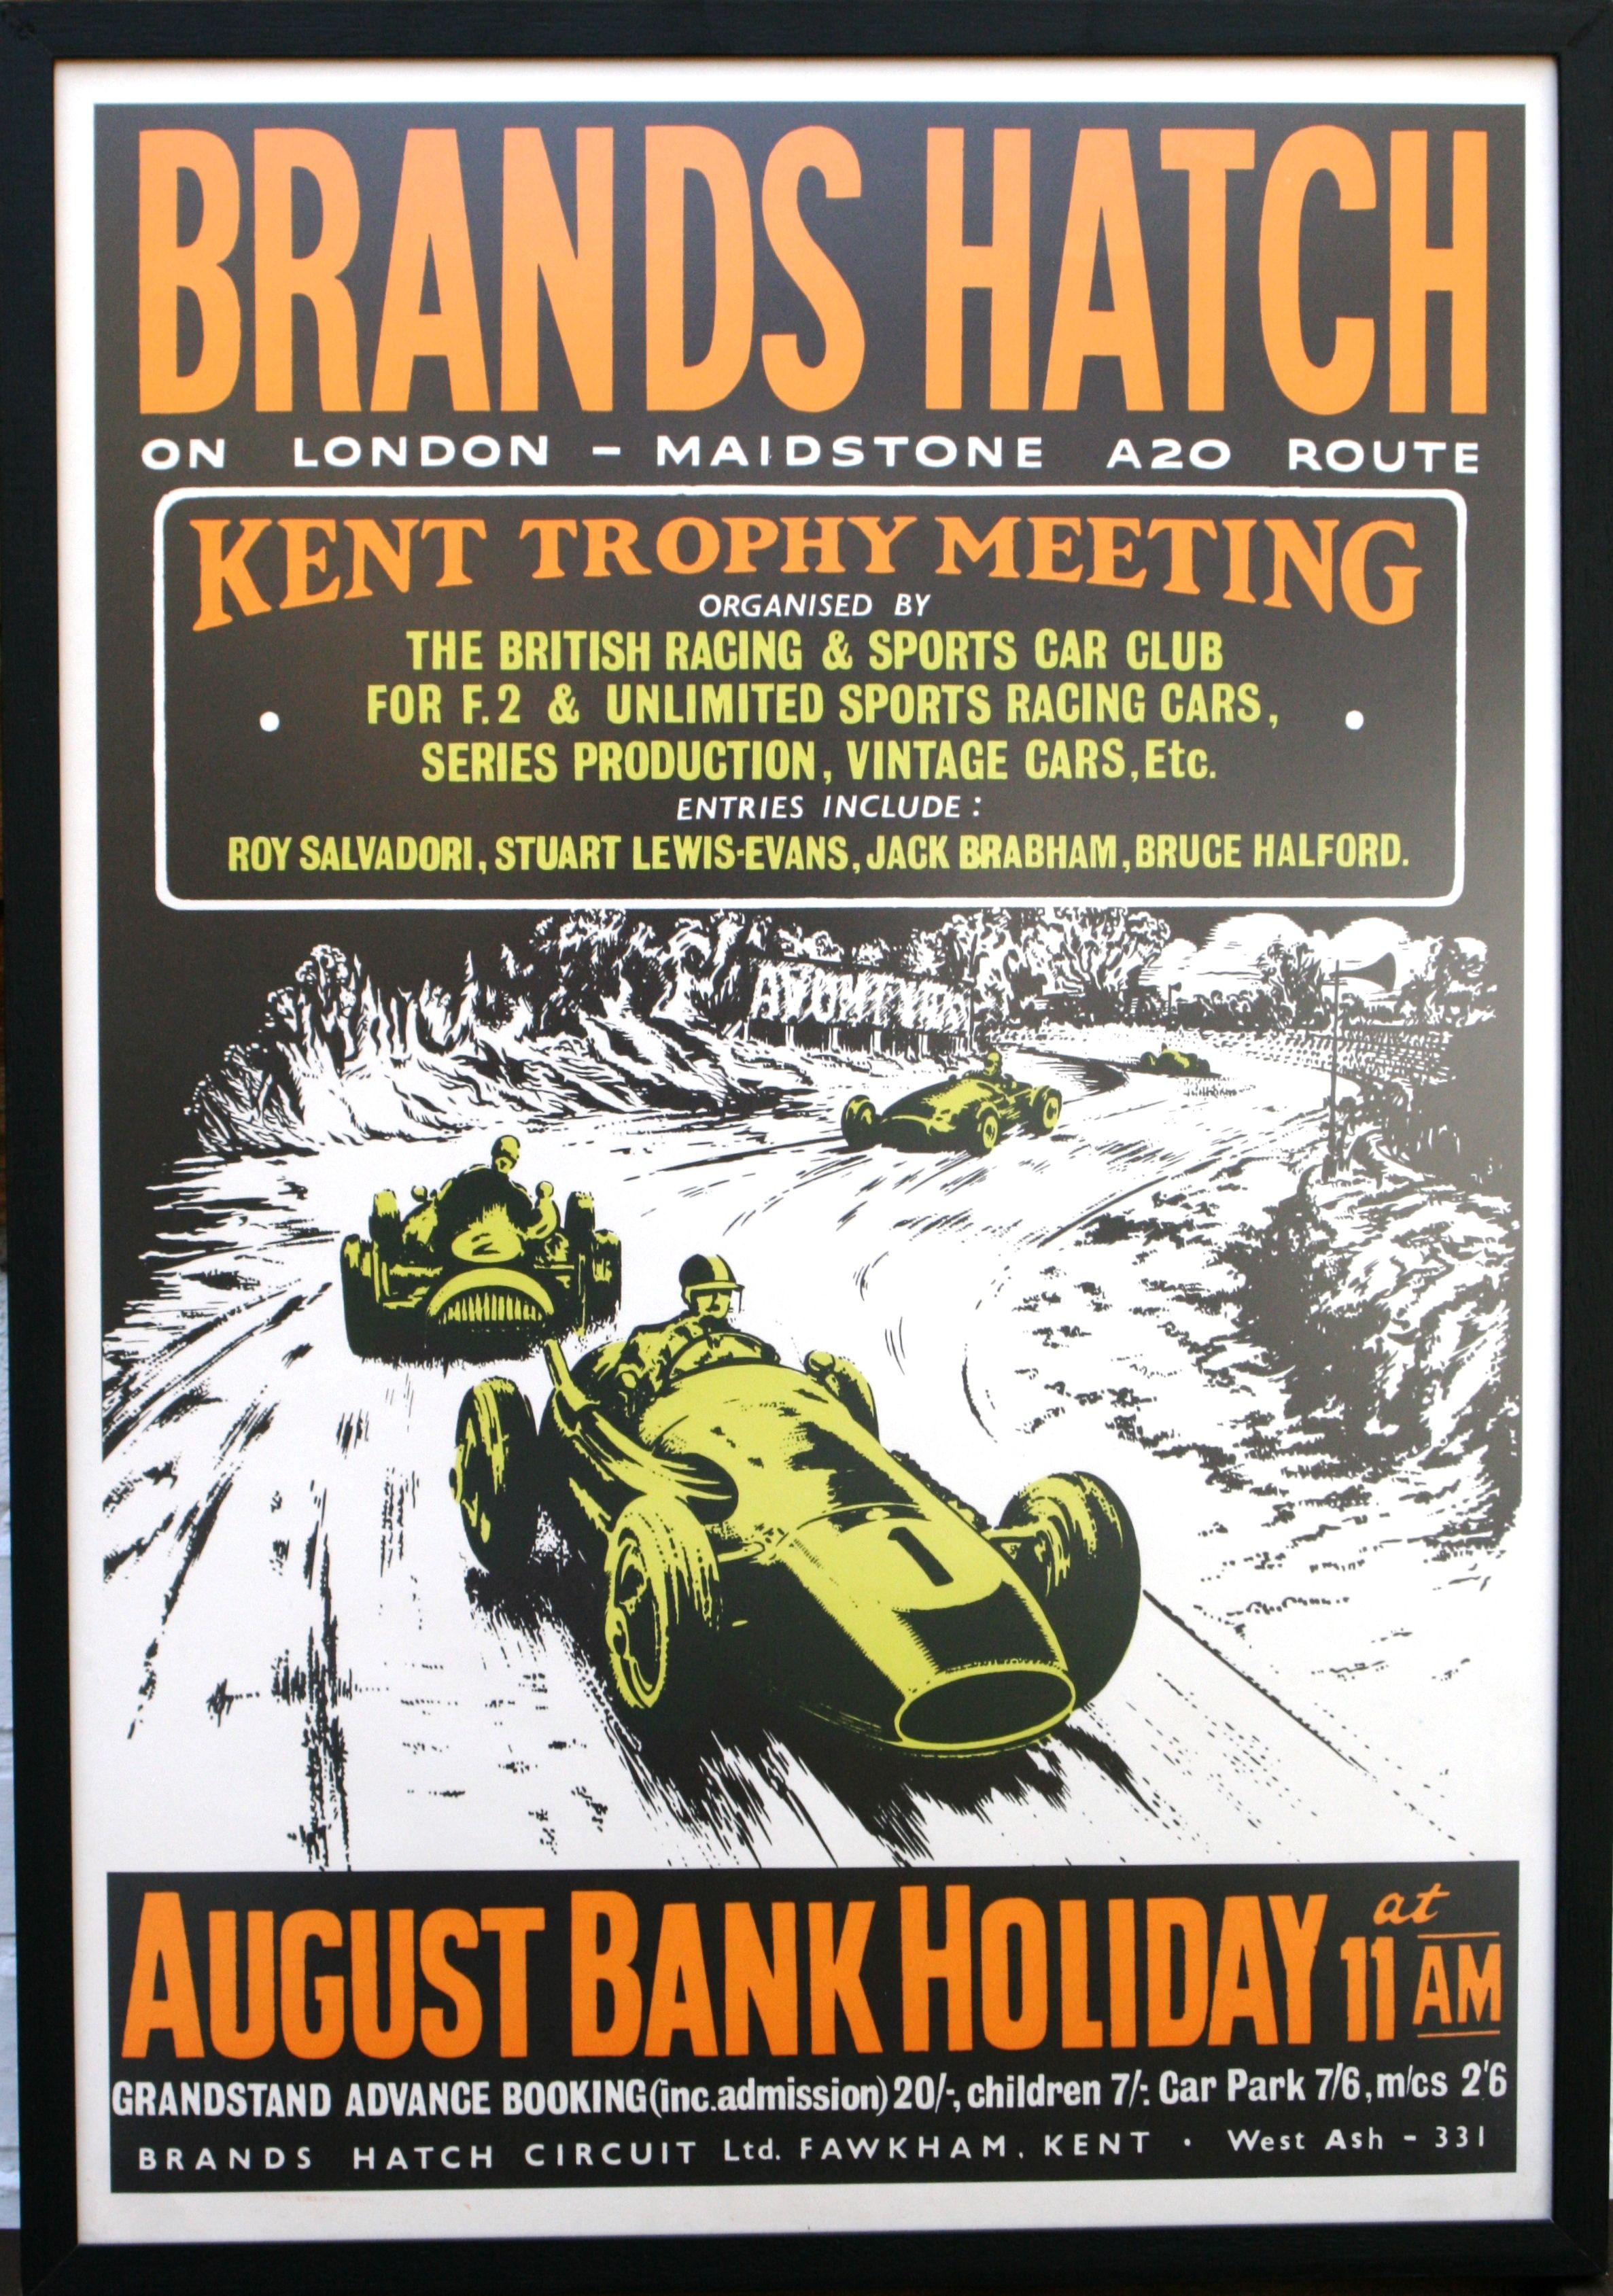 Brands Hatch Kent Trophy Meeting, 1960s - original vintage ...